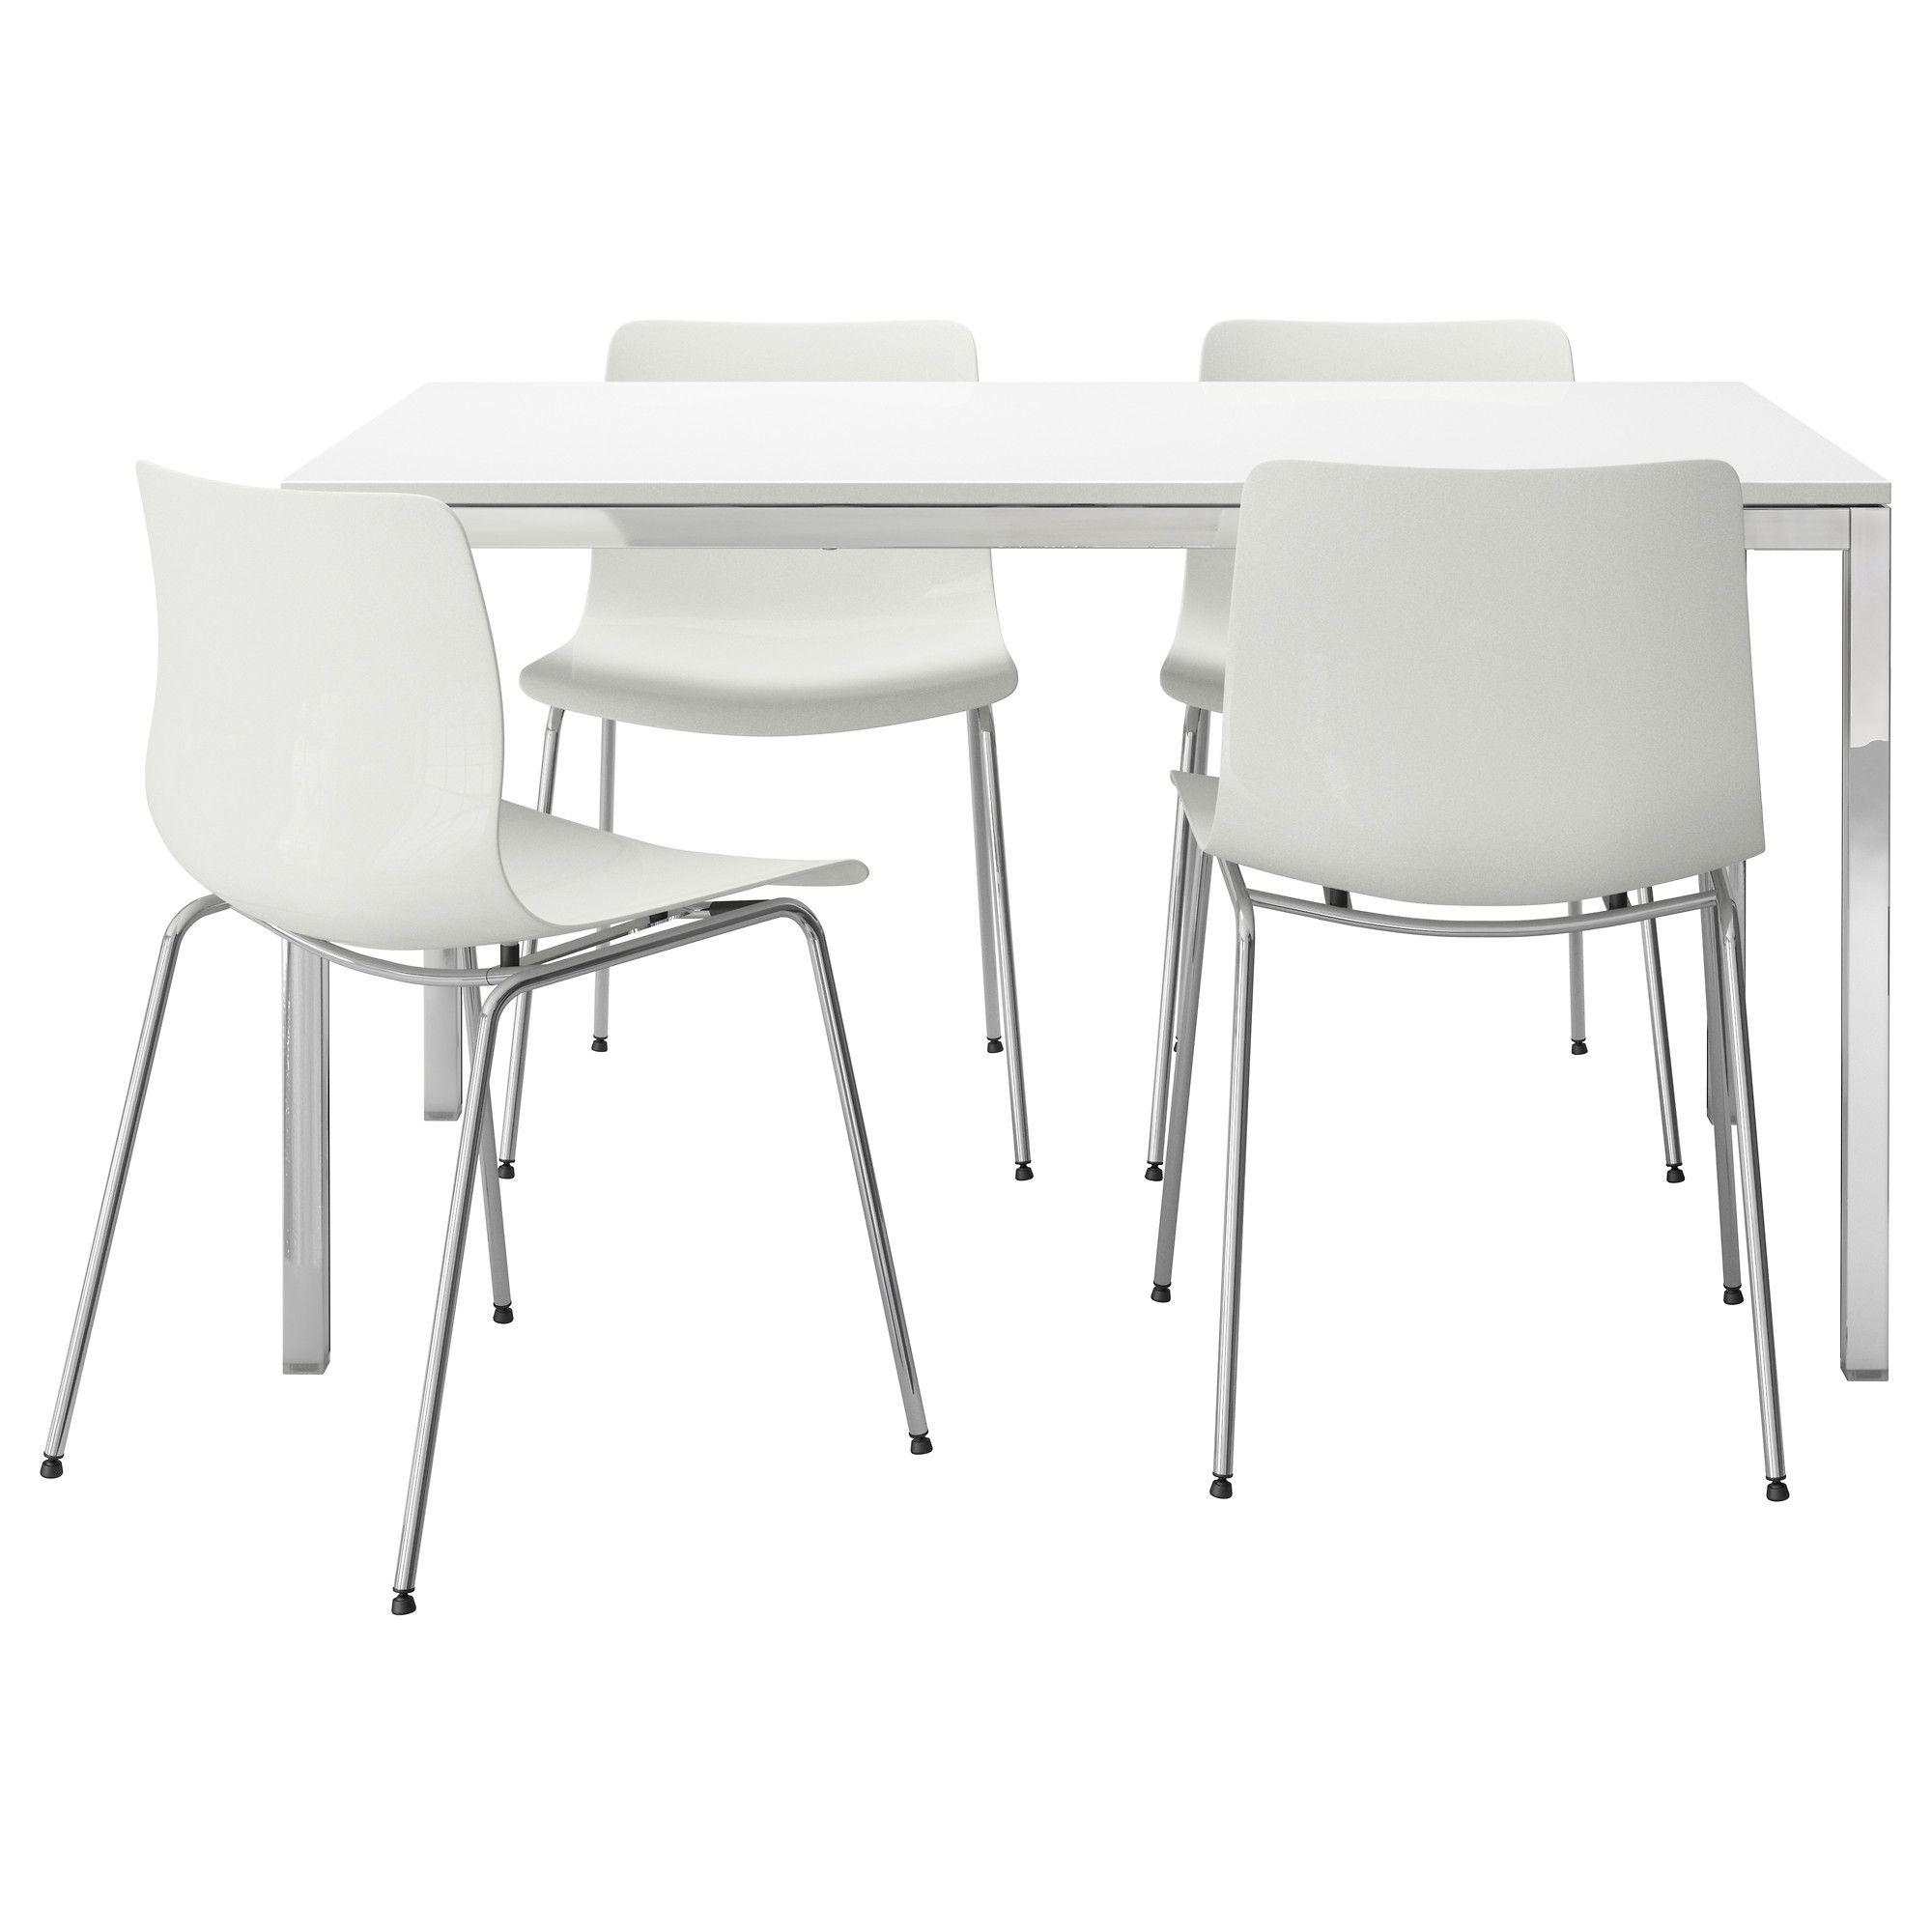 Ikea Us Furniture And Home Furnishings Kitchen Table Settings